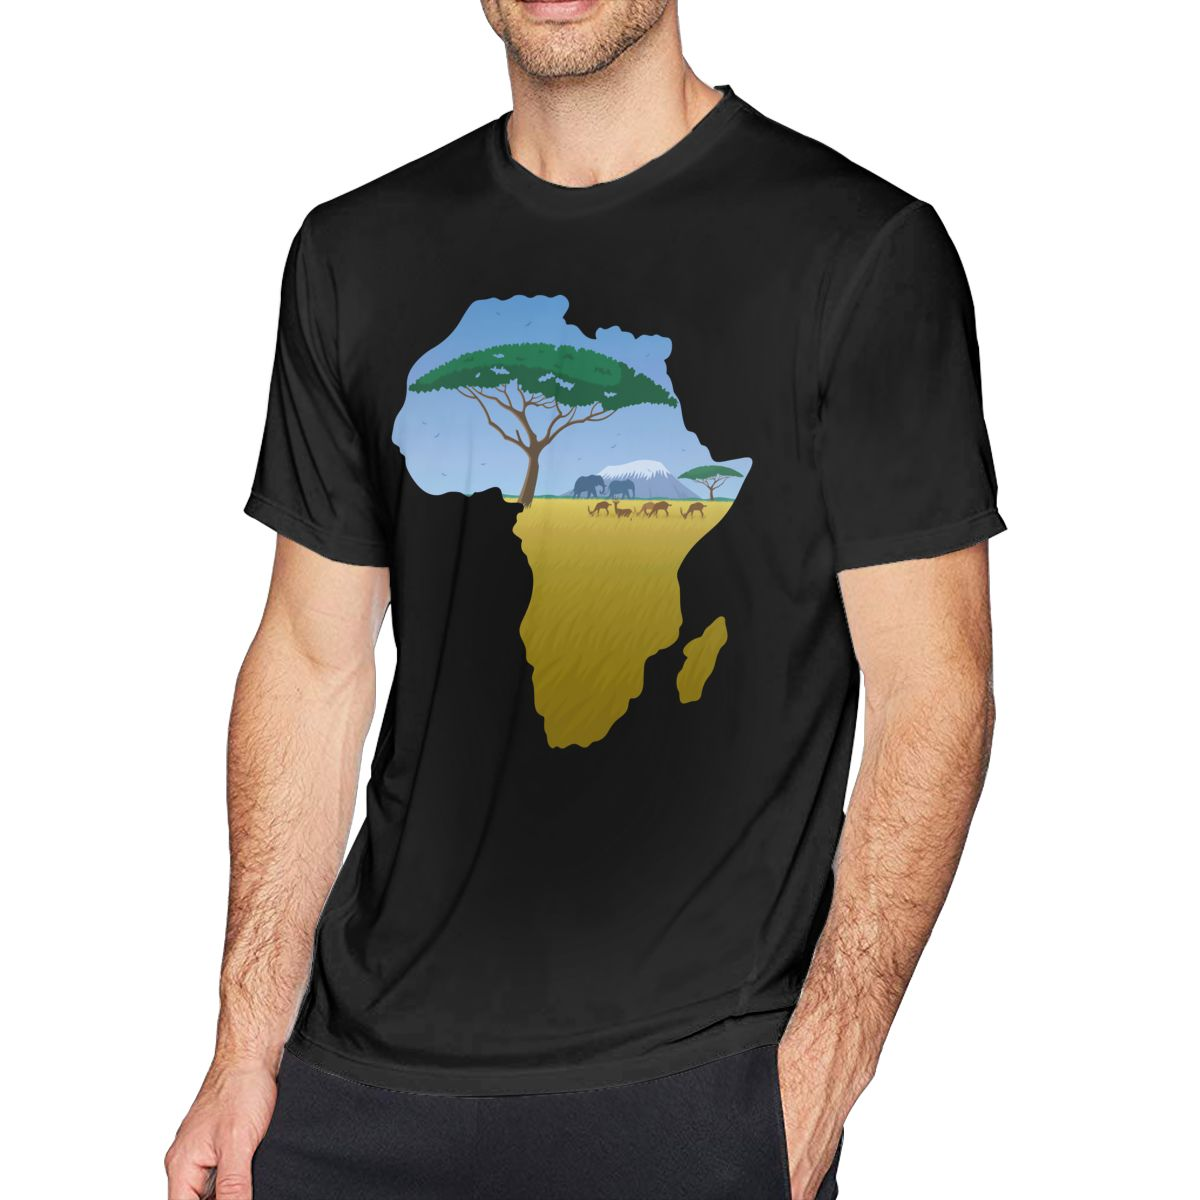 Camiseta Gazelle con mapa de África, camiseta de 2 Hombre estampado, camiseta de manga corta 4xl, camiseta de playa 100 de algodón